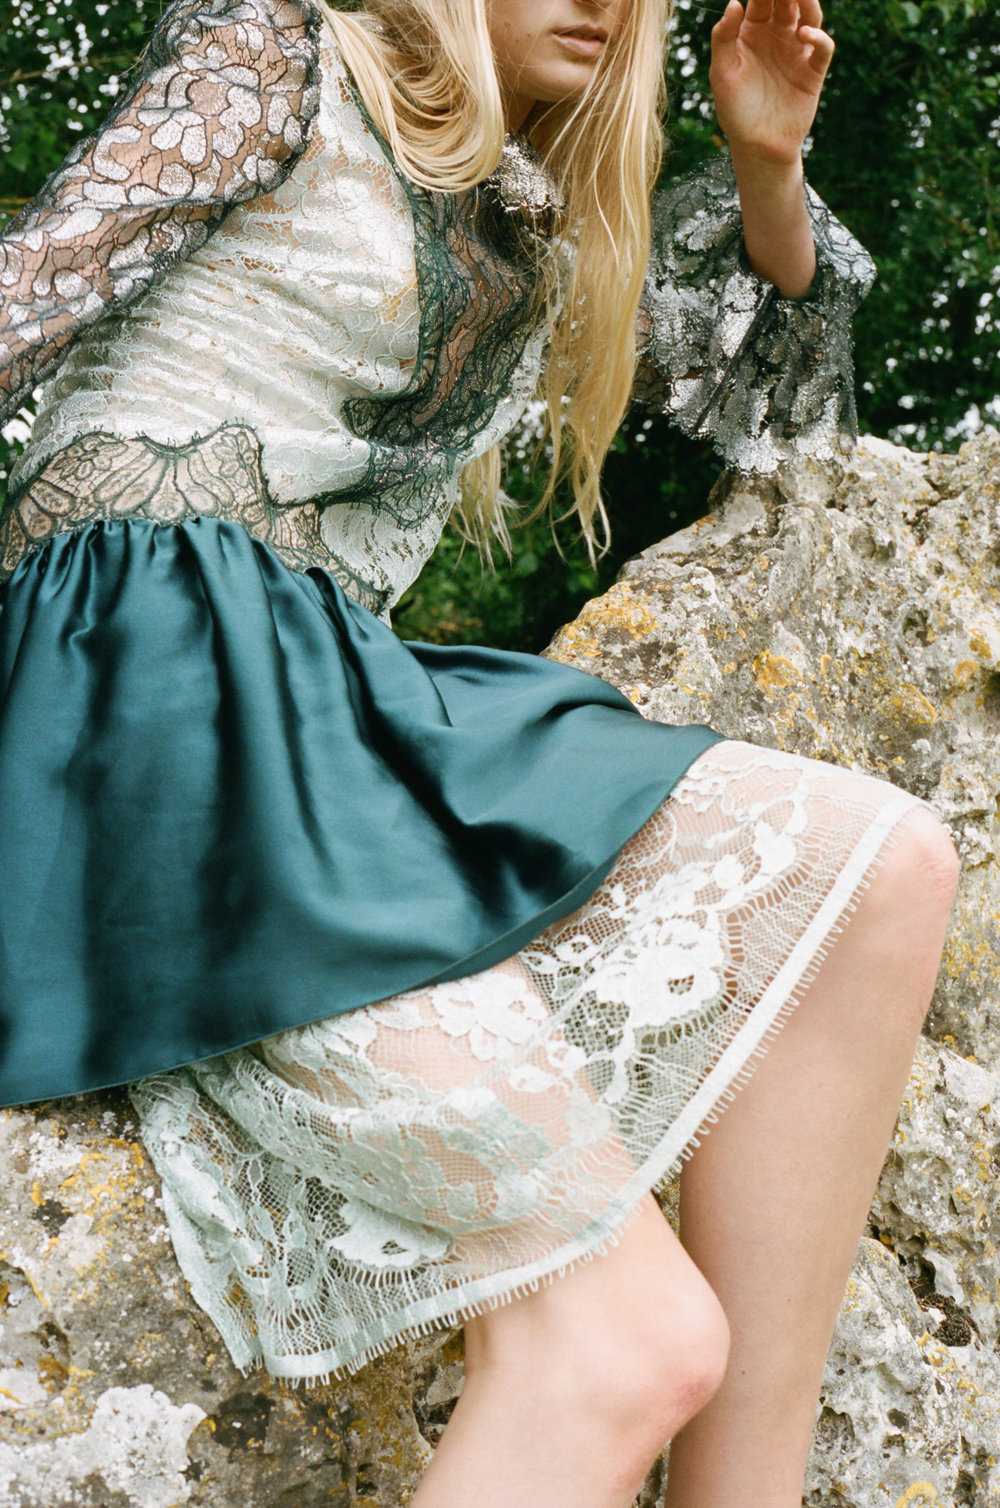 amber_mahoney_lula_japan_english_countryside_fashion_editorial_film_012.jpg